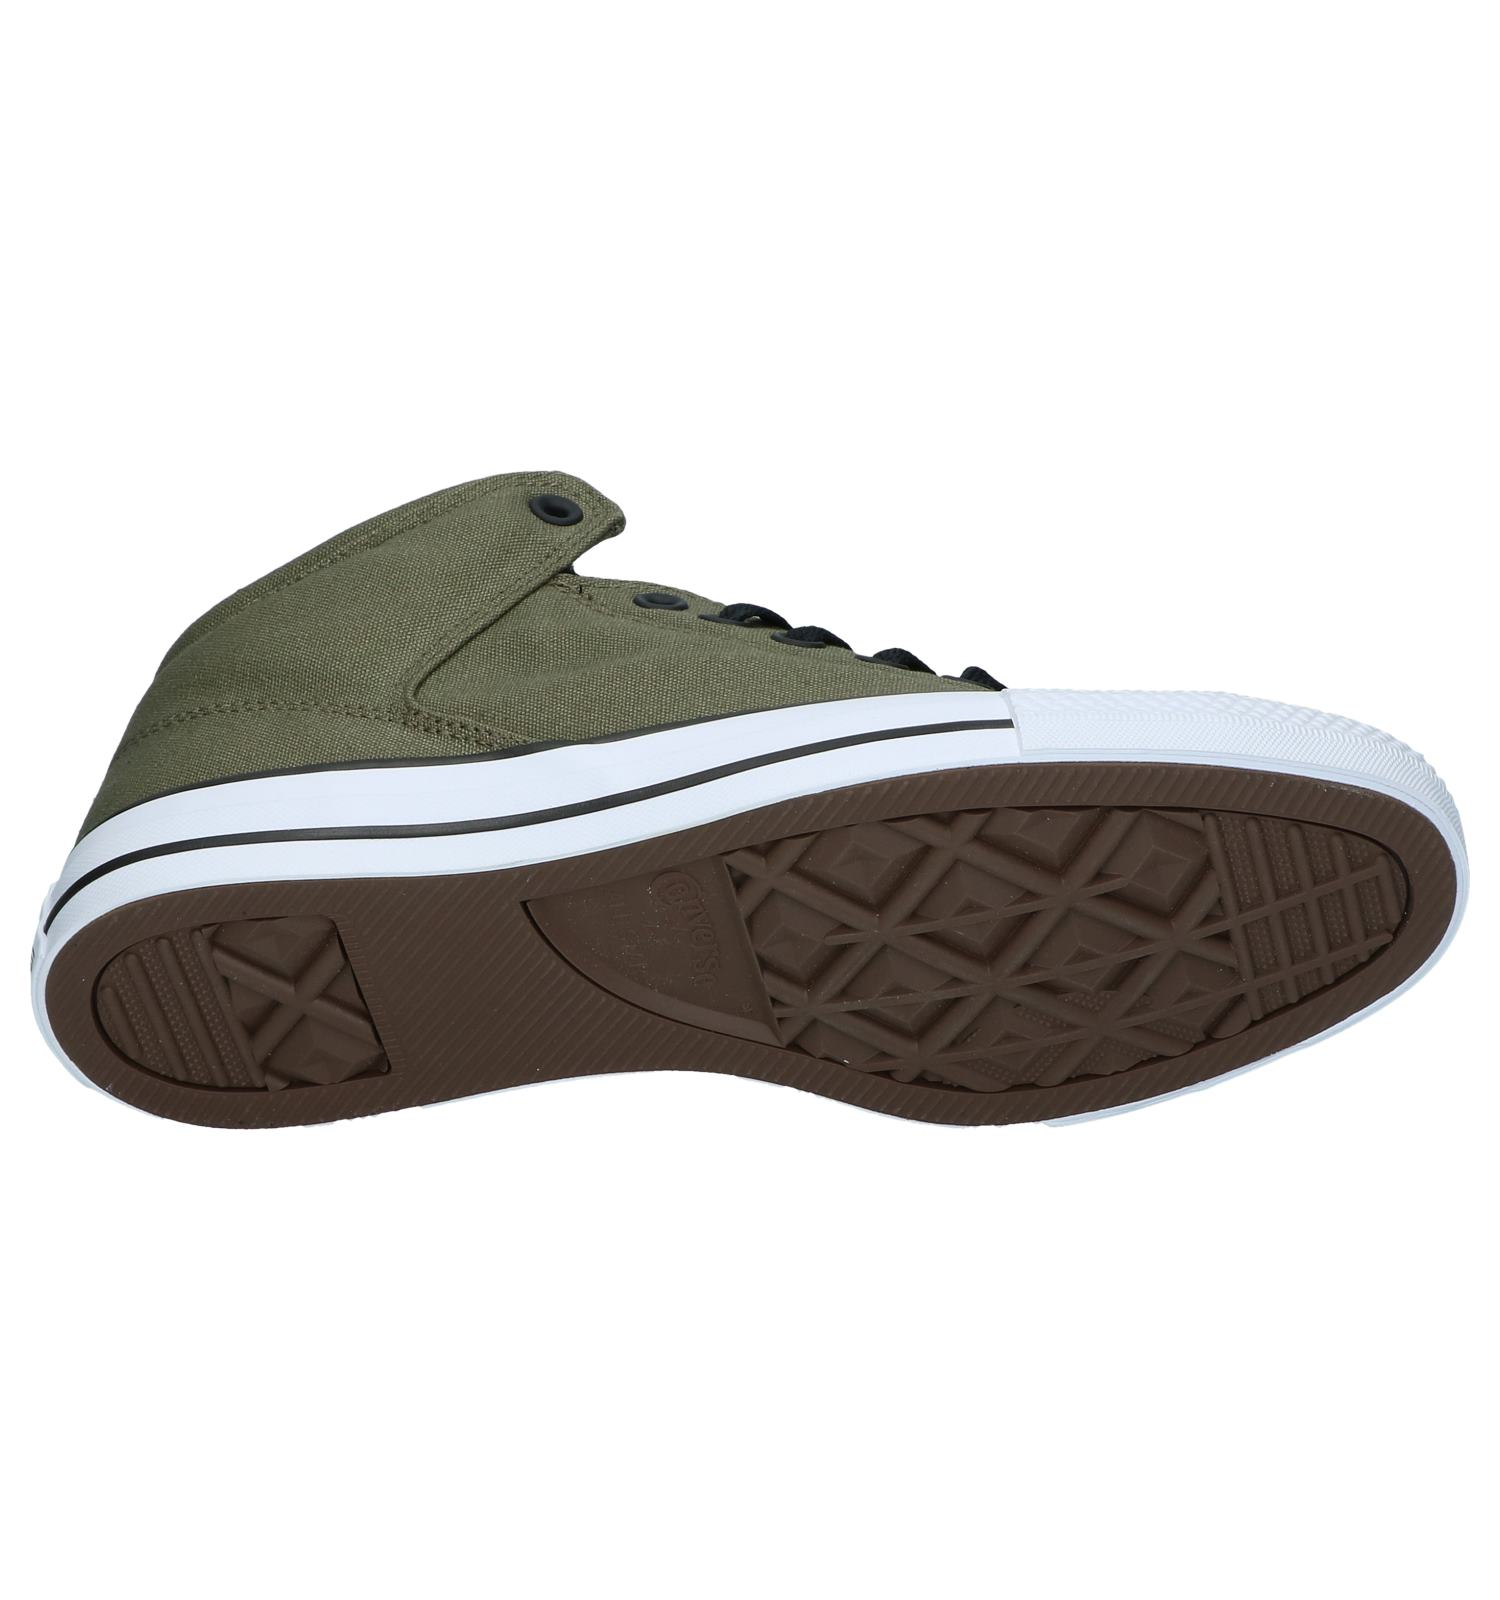 456b606aed6 Kaki Hoge Sneakers Converse Chuck Taylor AS High Street | TORFS.BE | Gratis  verzend en retour